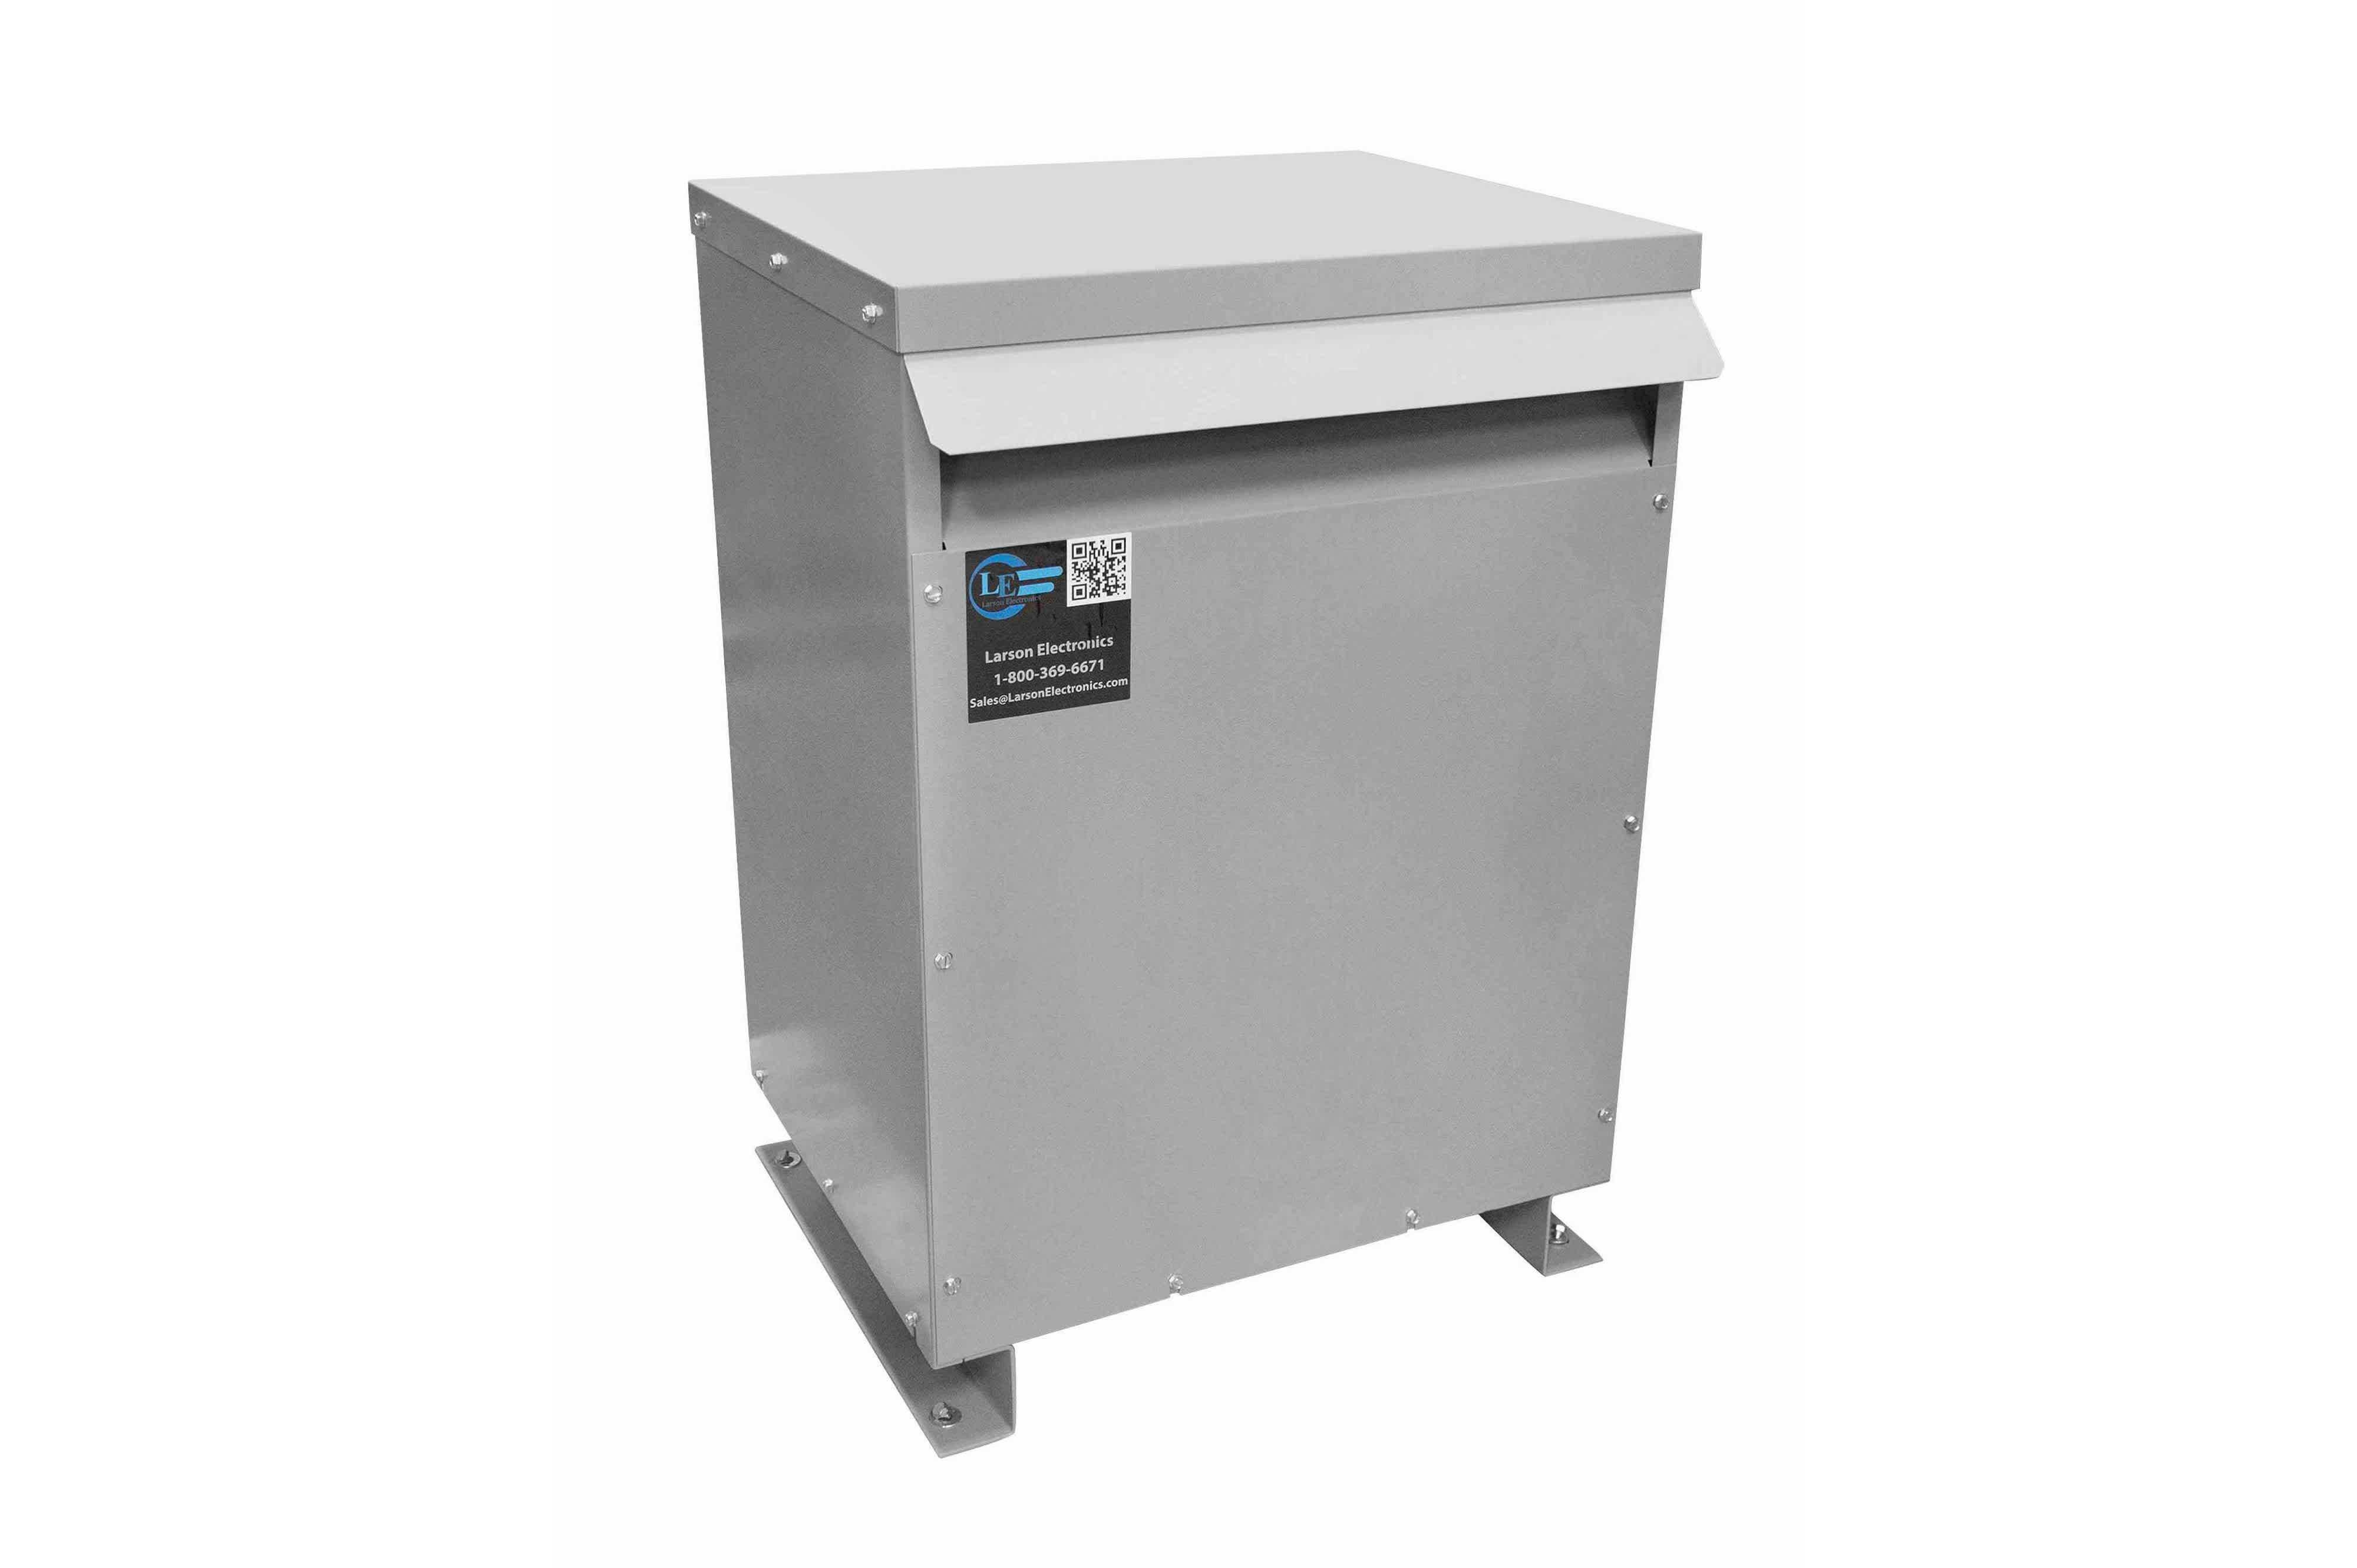 47.5 kVA 3PH Isolation Transformer, 240V Wye Primary, 380V Delta Secondary, N3R, Ventilated, 60 Hz